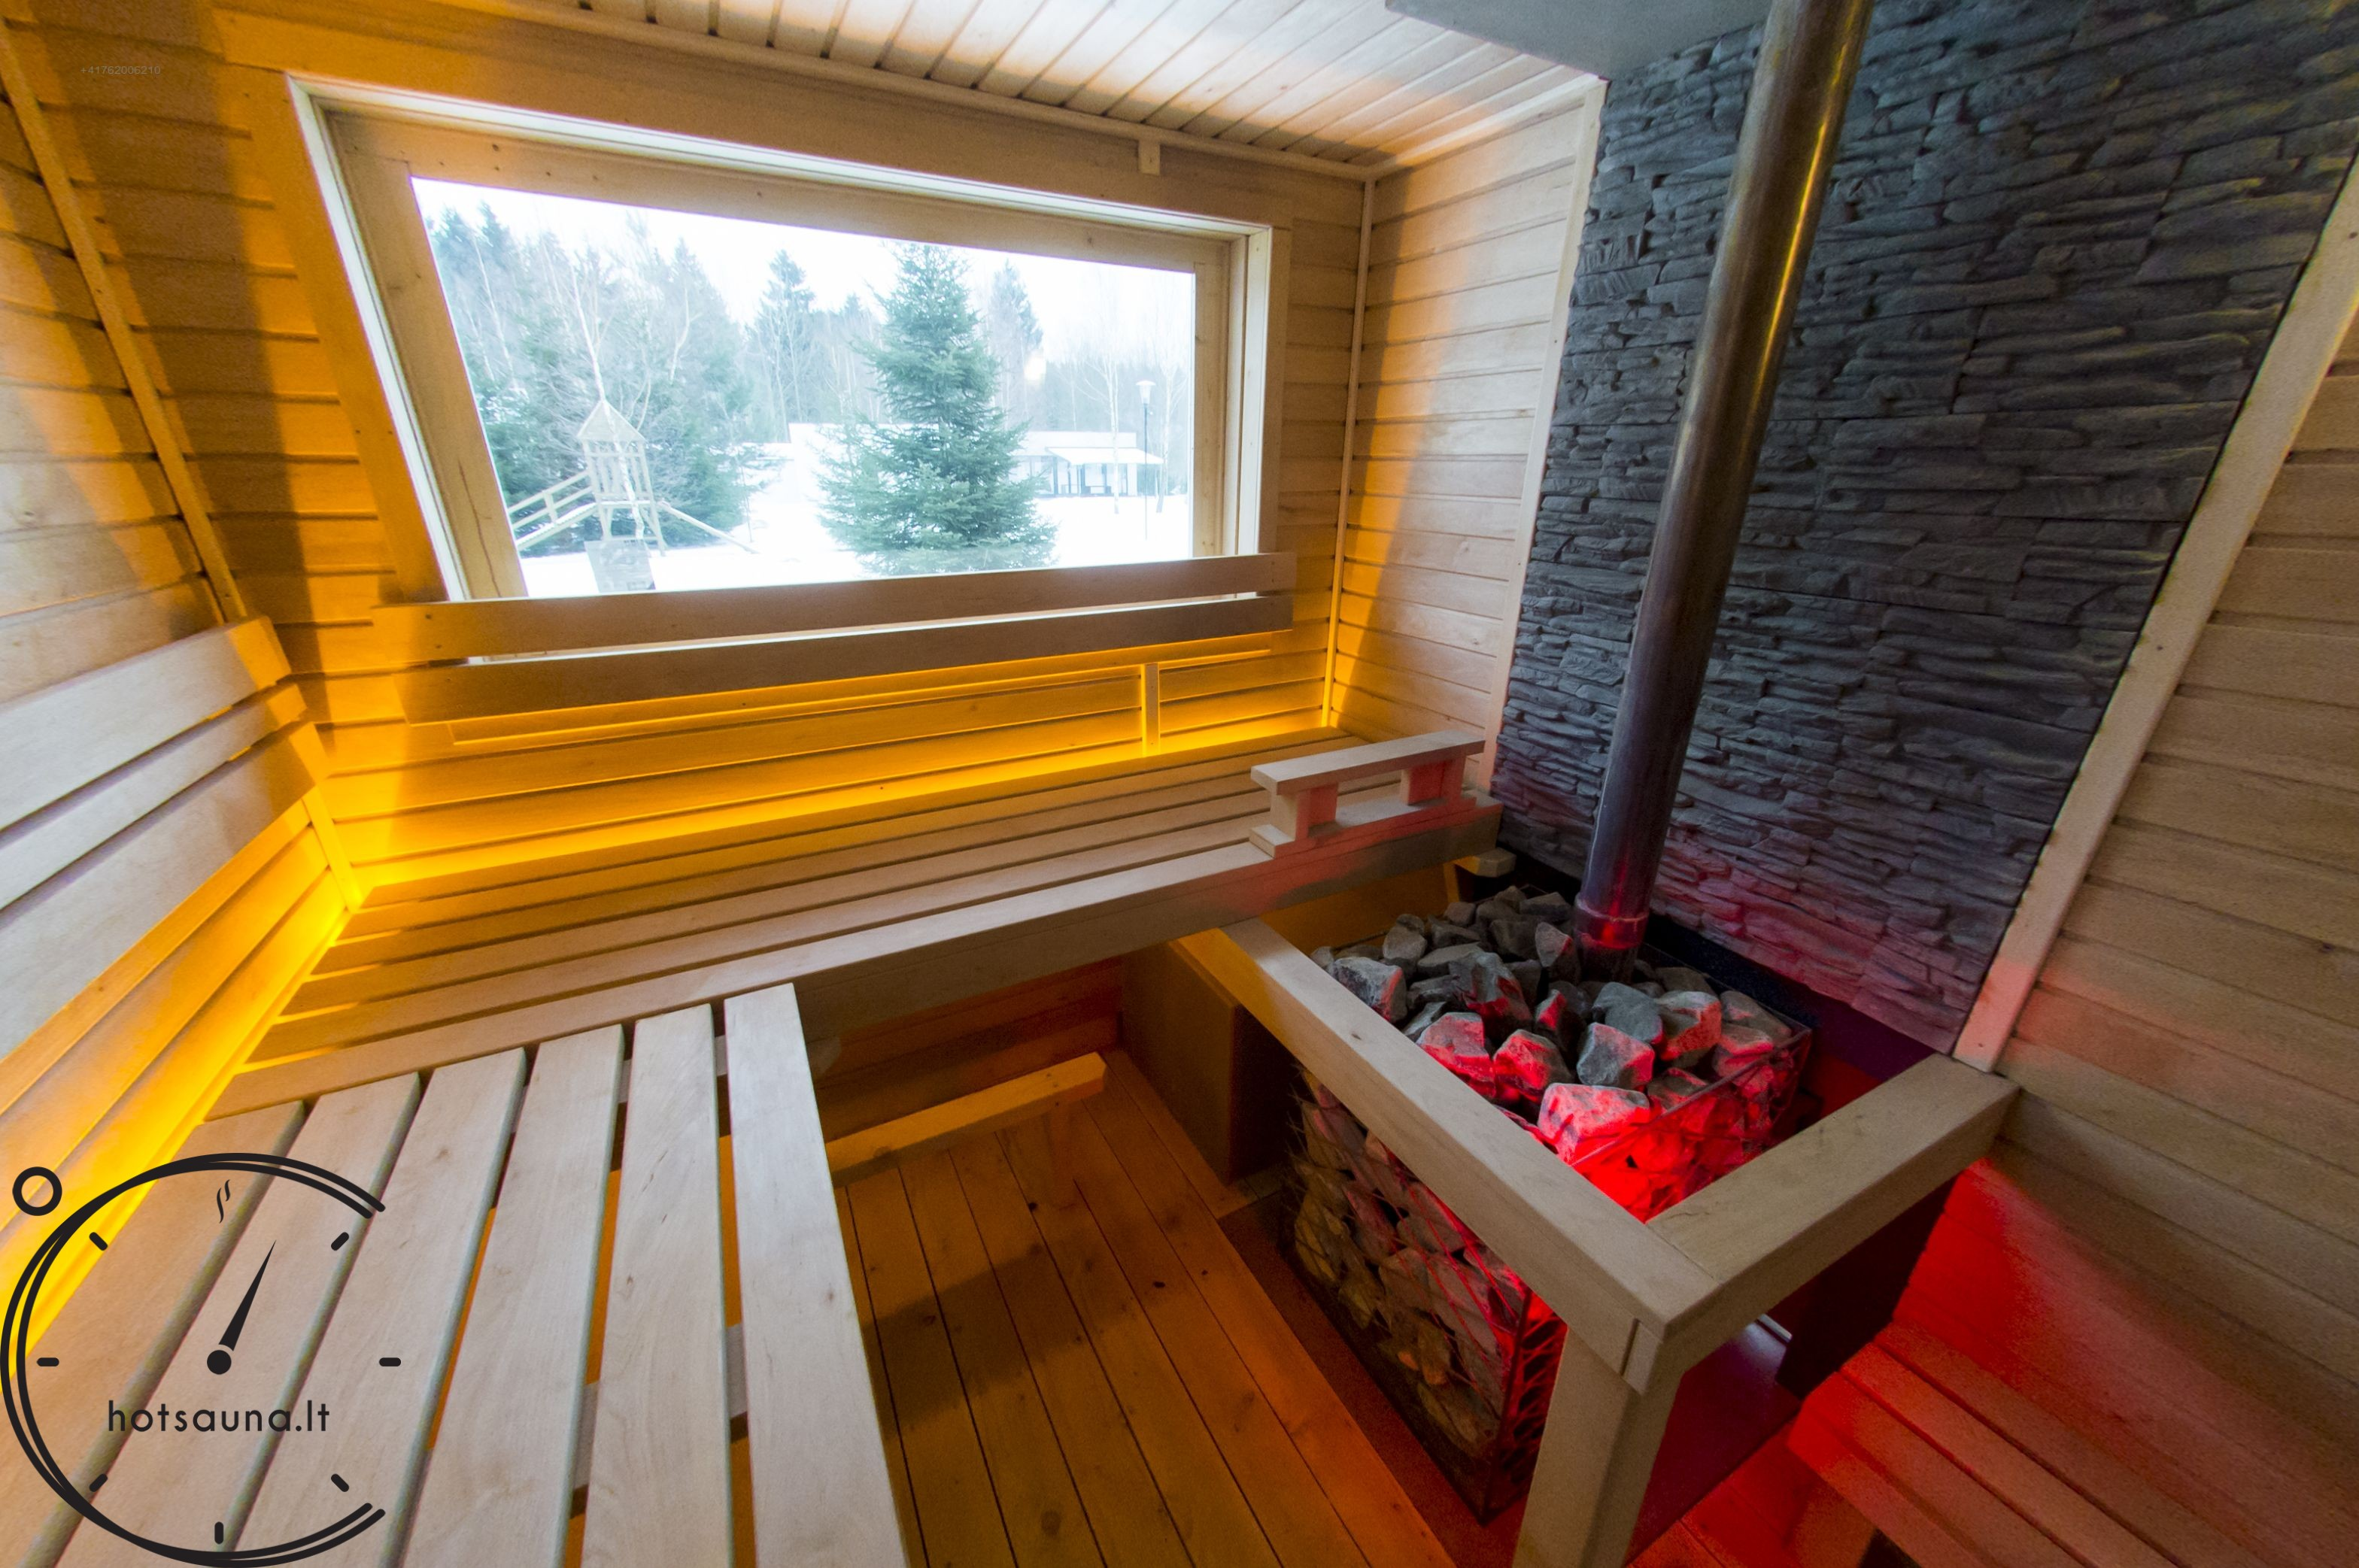 sauna for sale kauferproduktion saunamd1 (14)